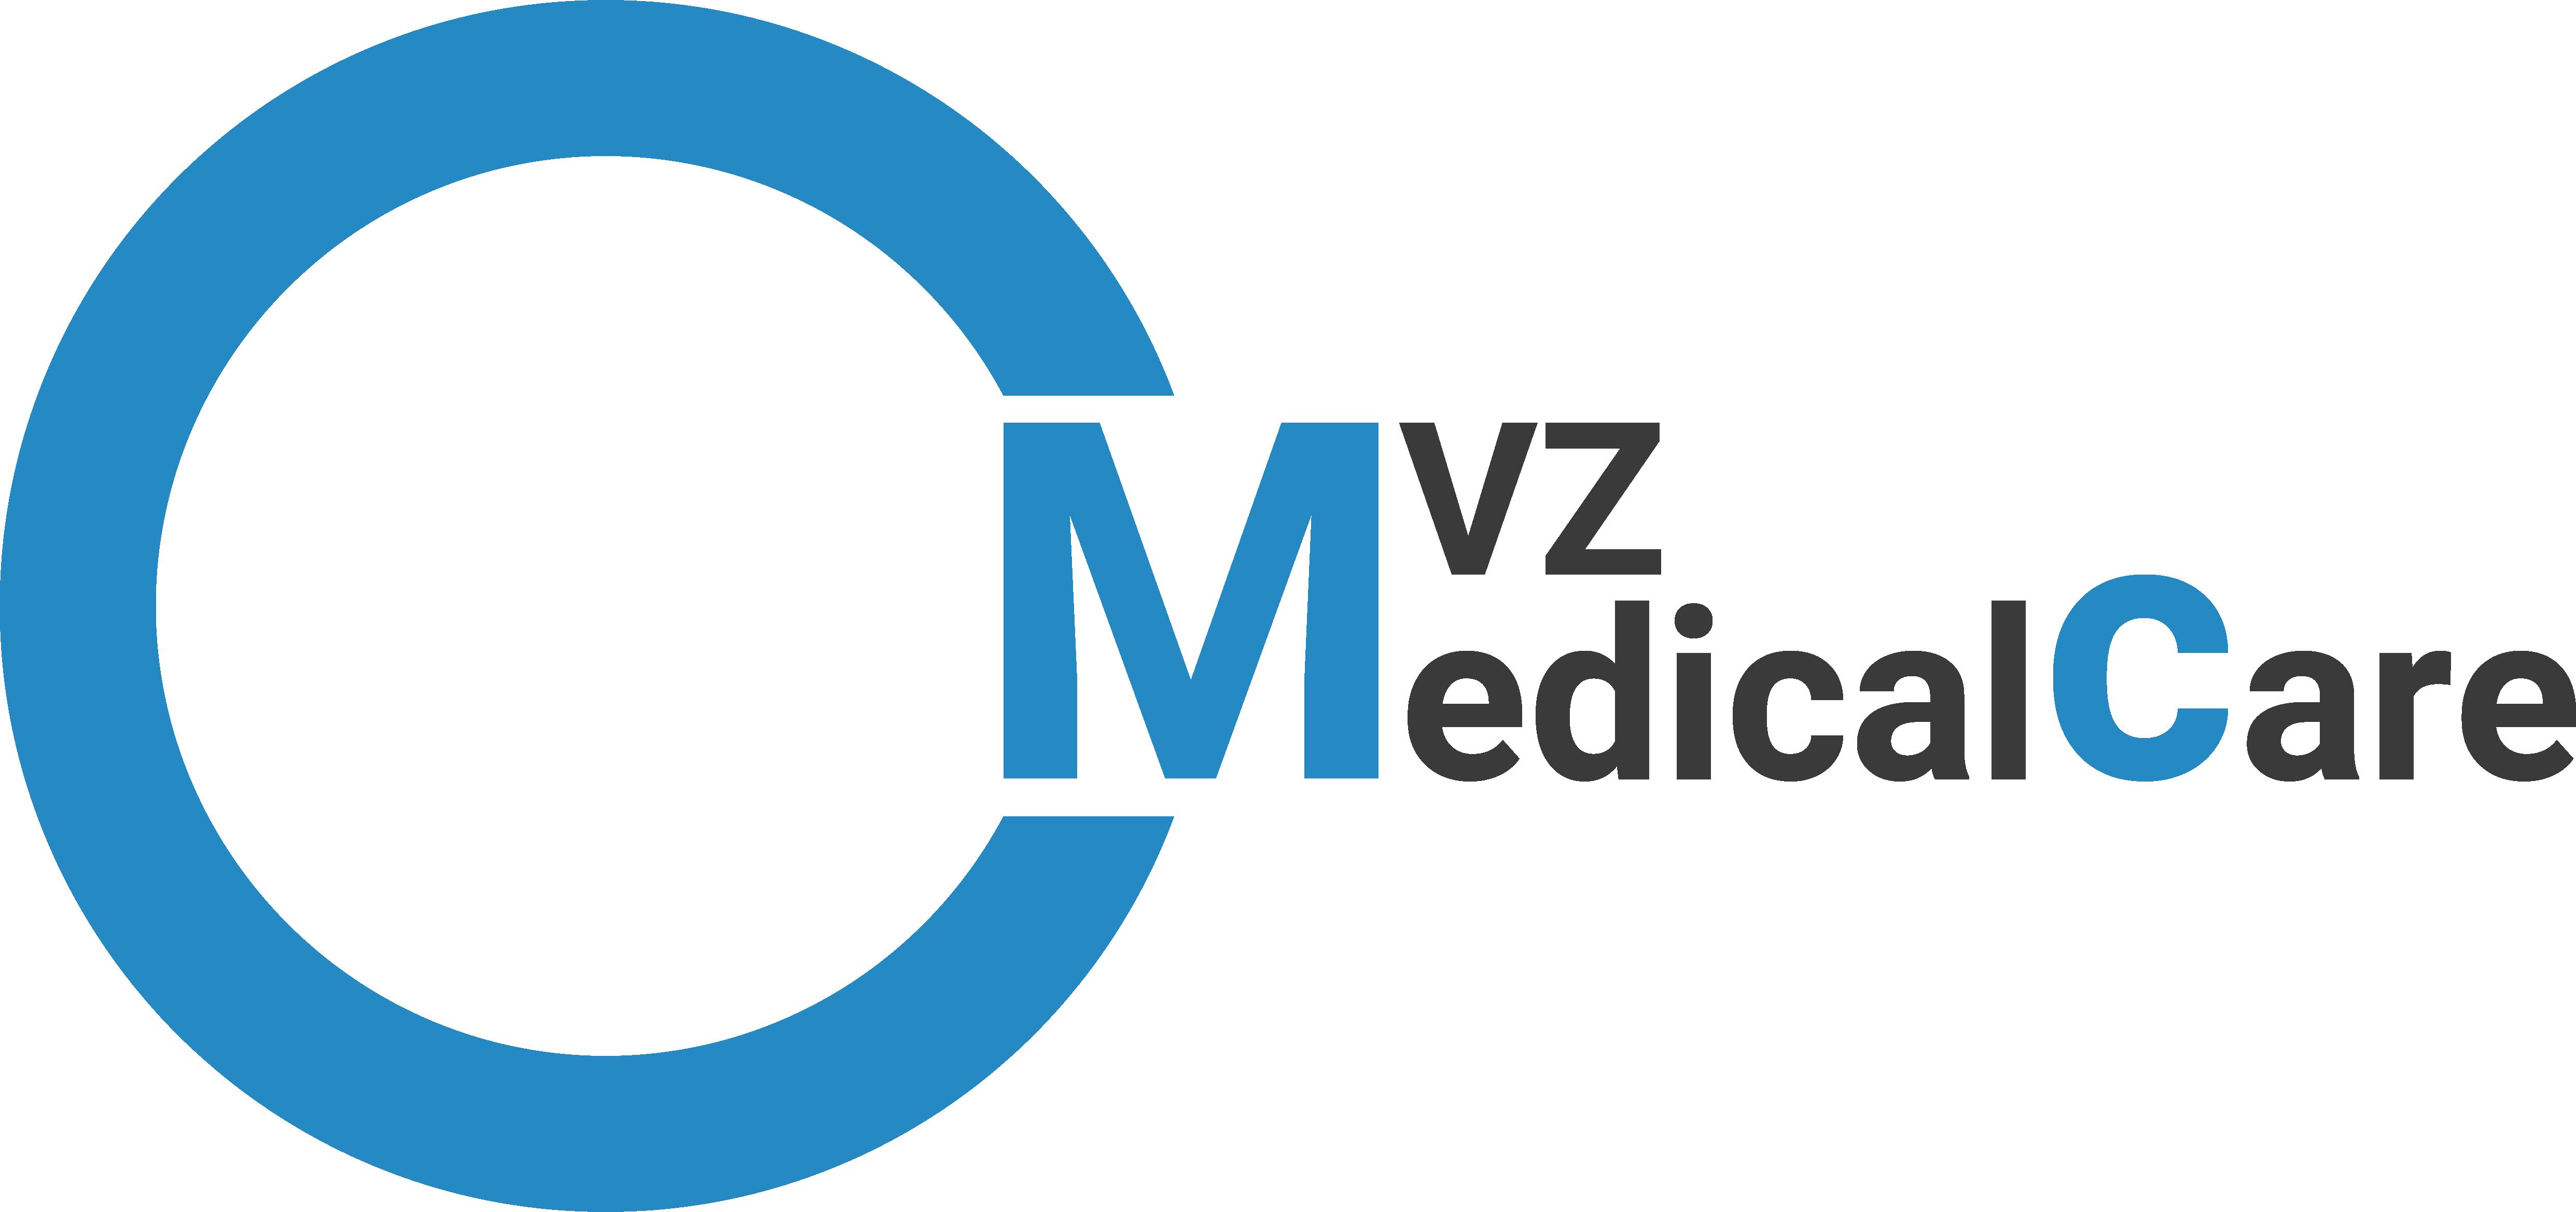 MVZ MedicalCare Testzentren Bad Homburg